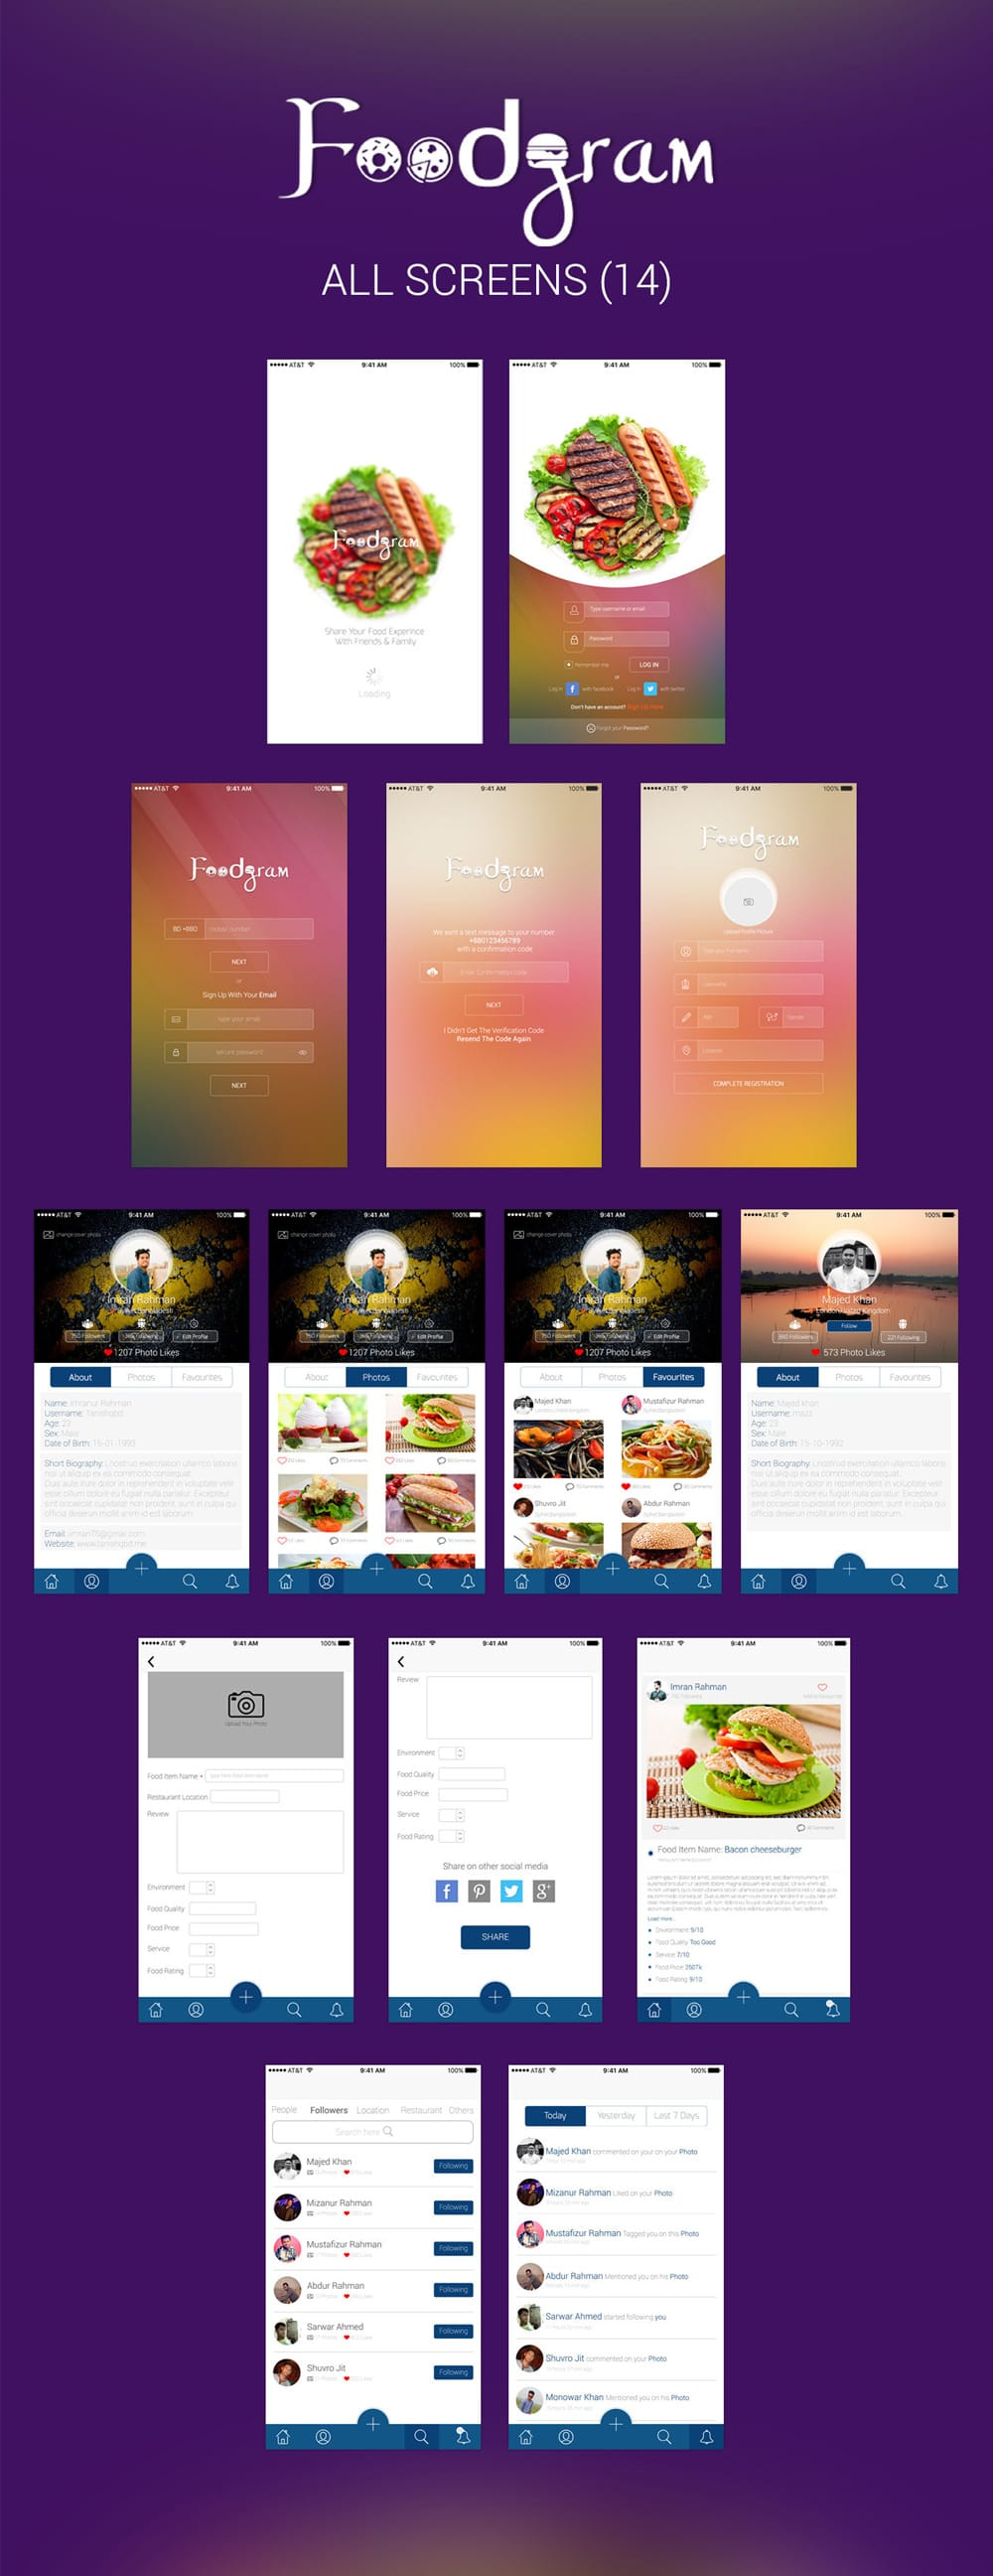 Foodgram - Free App UI PSD